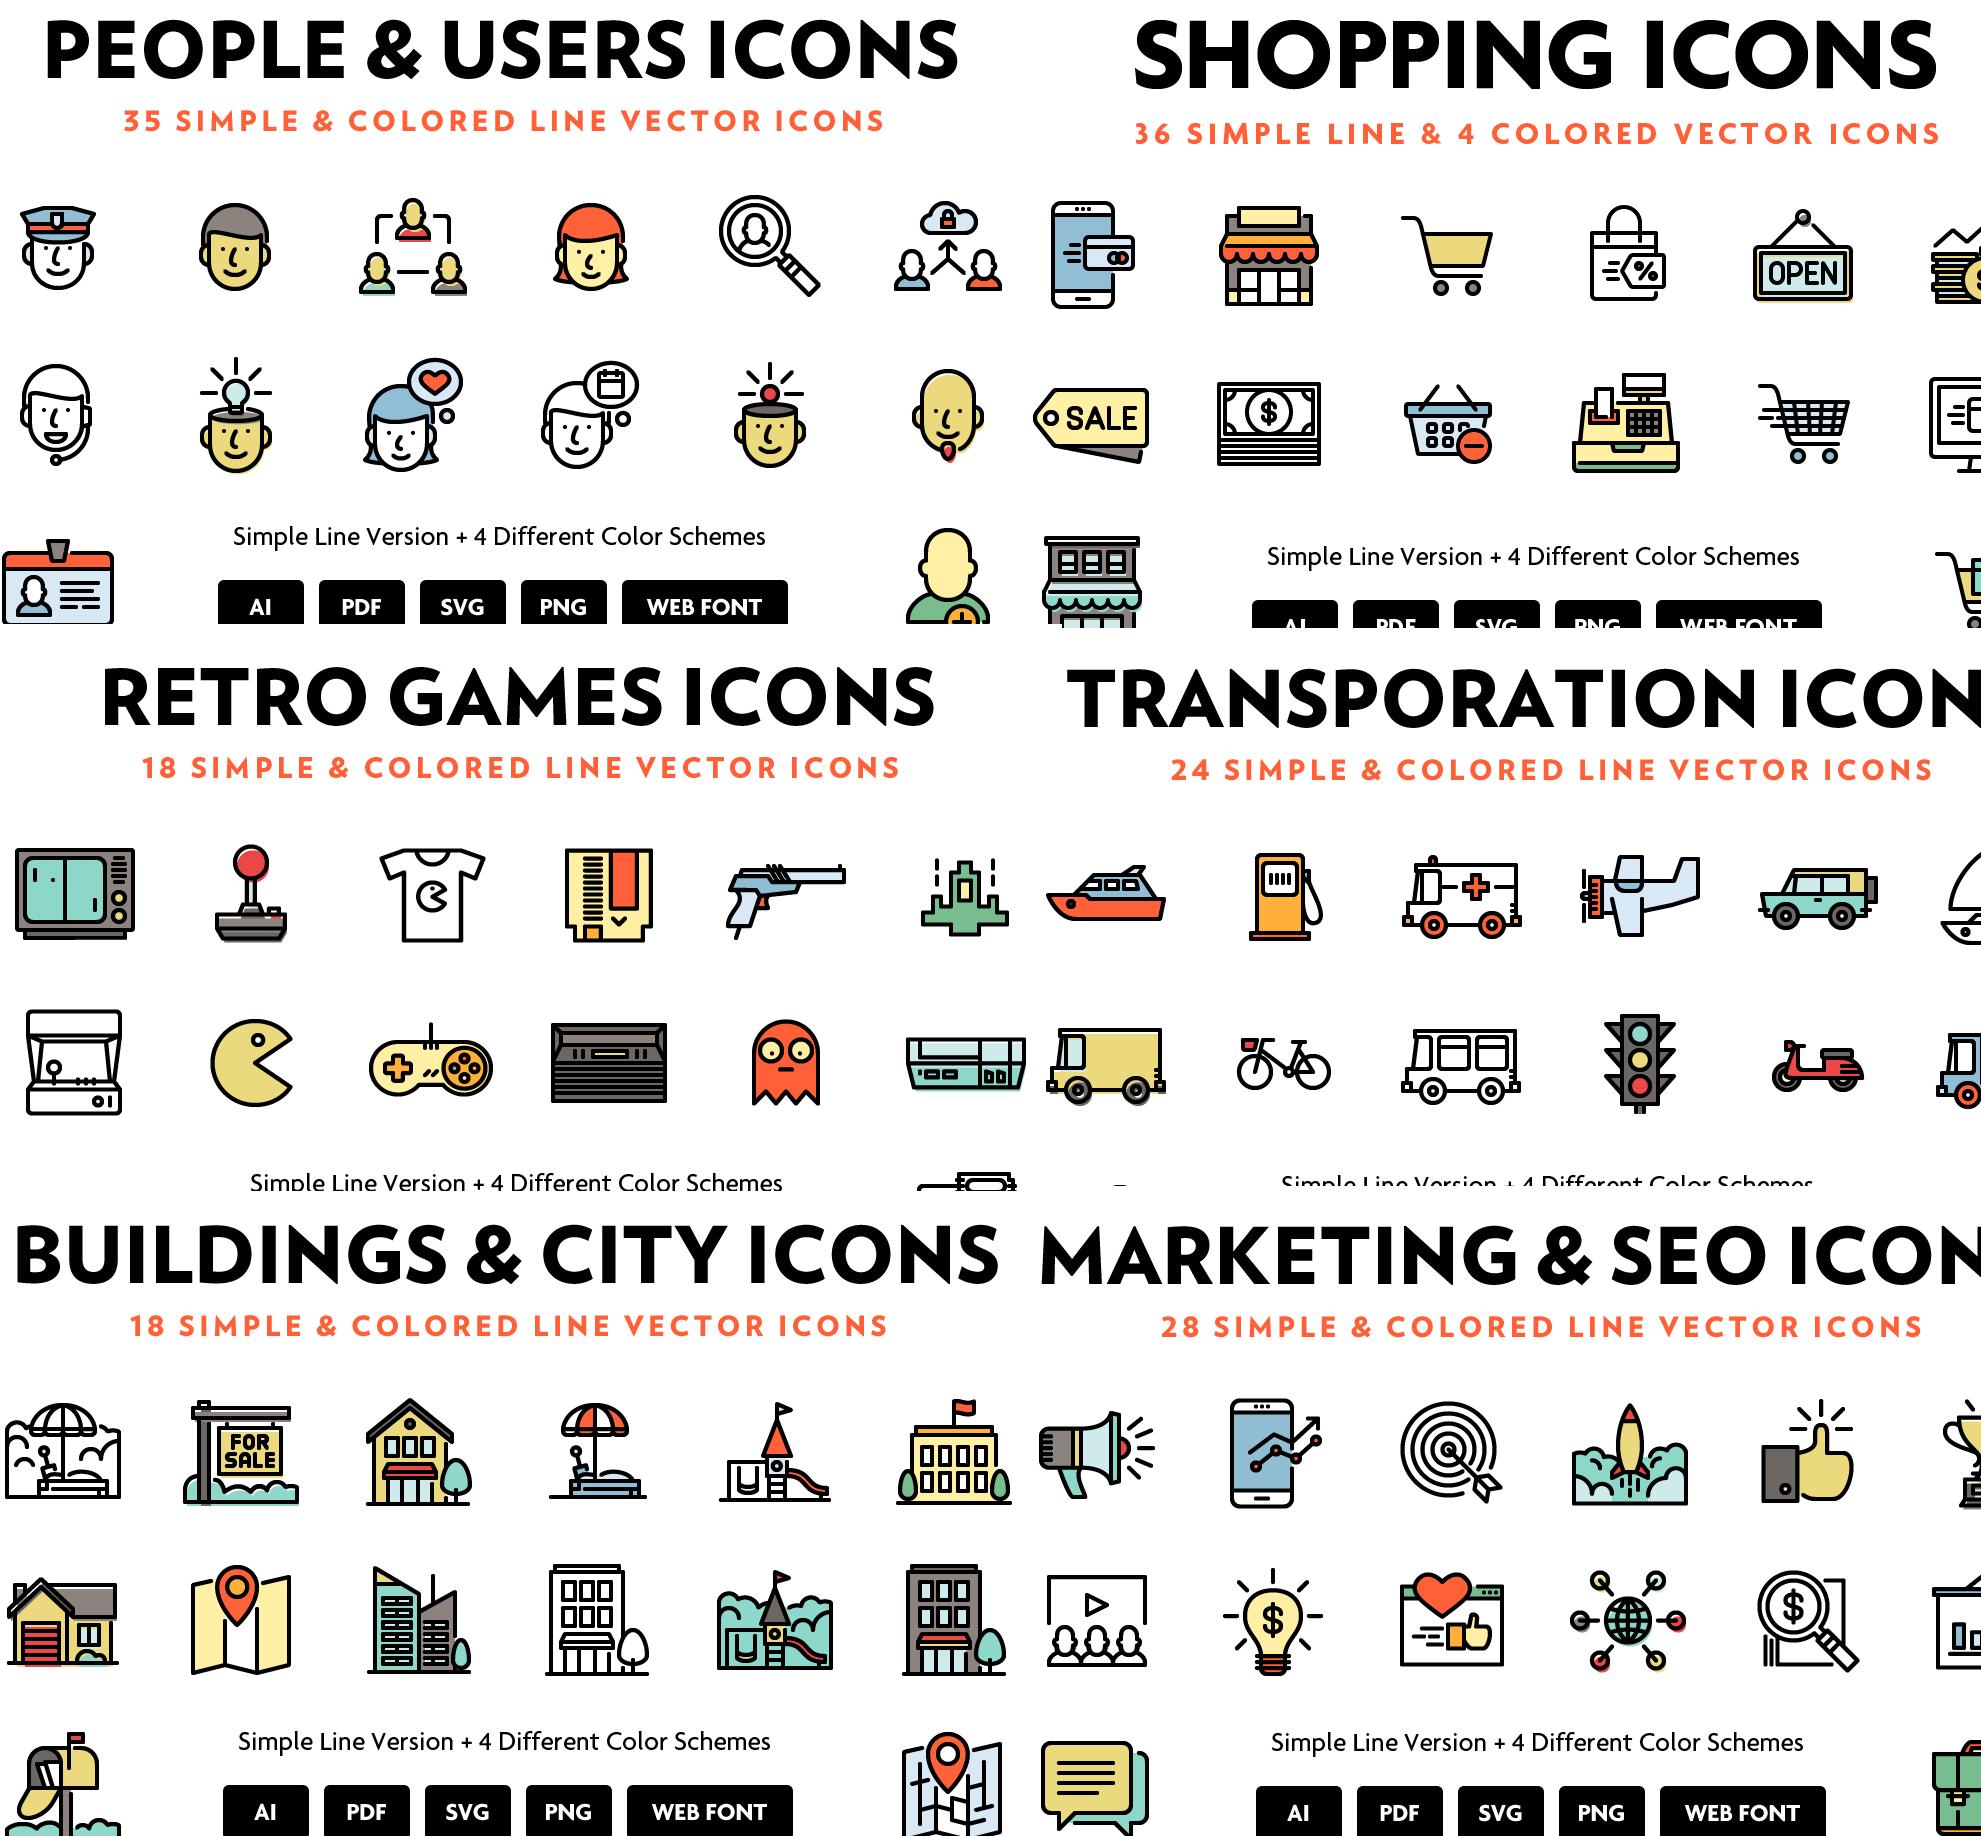 ps素材 ui产品ico图标 交通游戏 购物城市 用户营销搜索设计6套